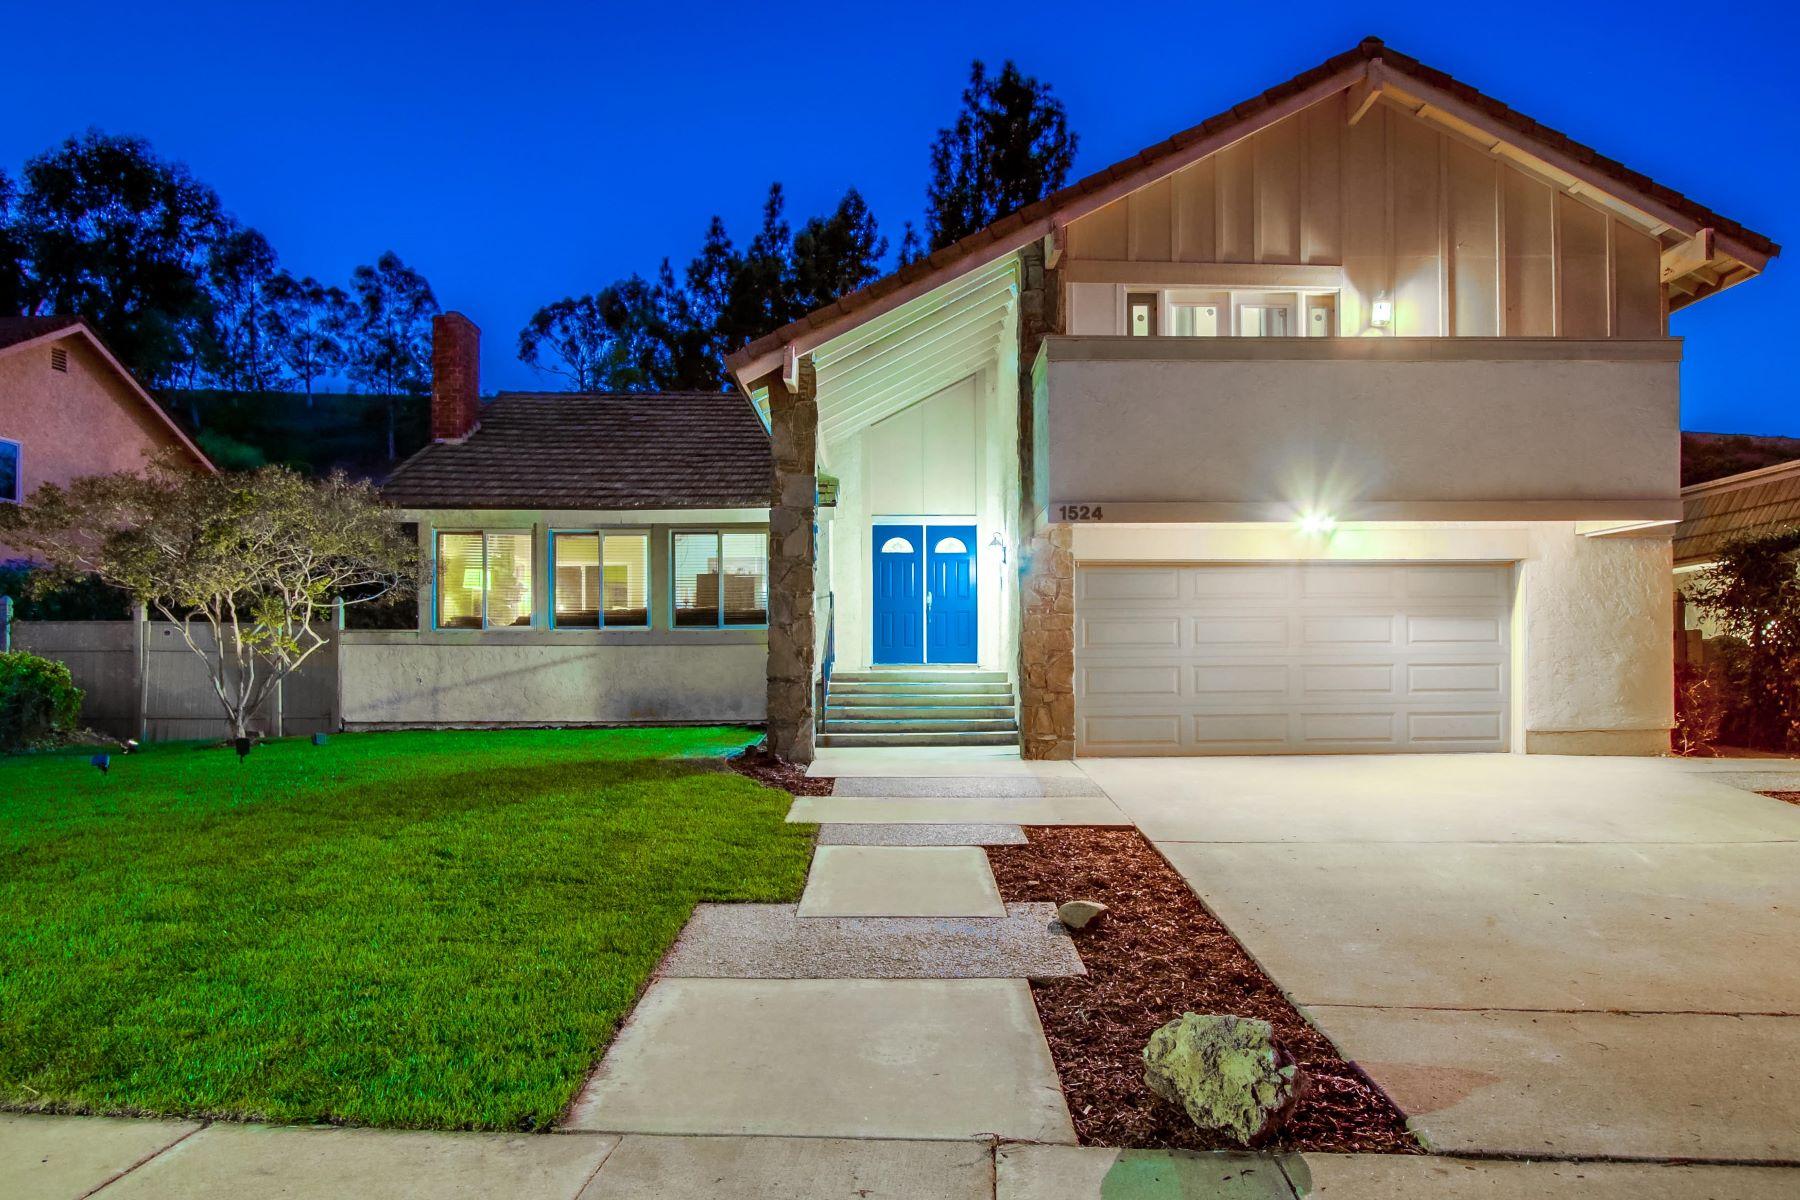 Single Family Homes for Sale at 1524 Whitsett Dr El Cajon, California 92020 United States